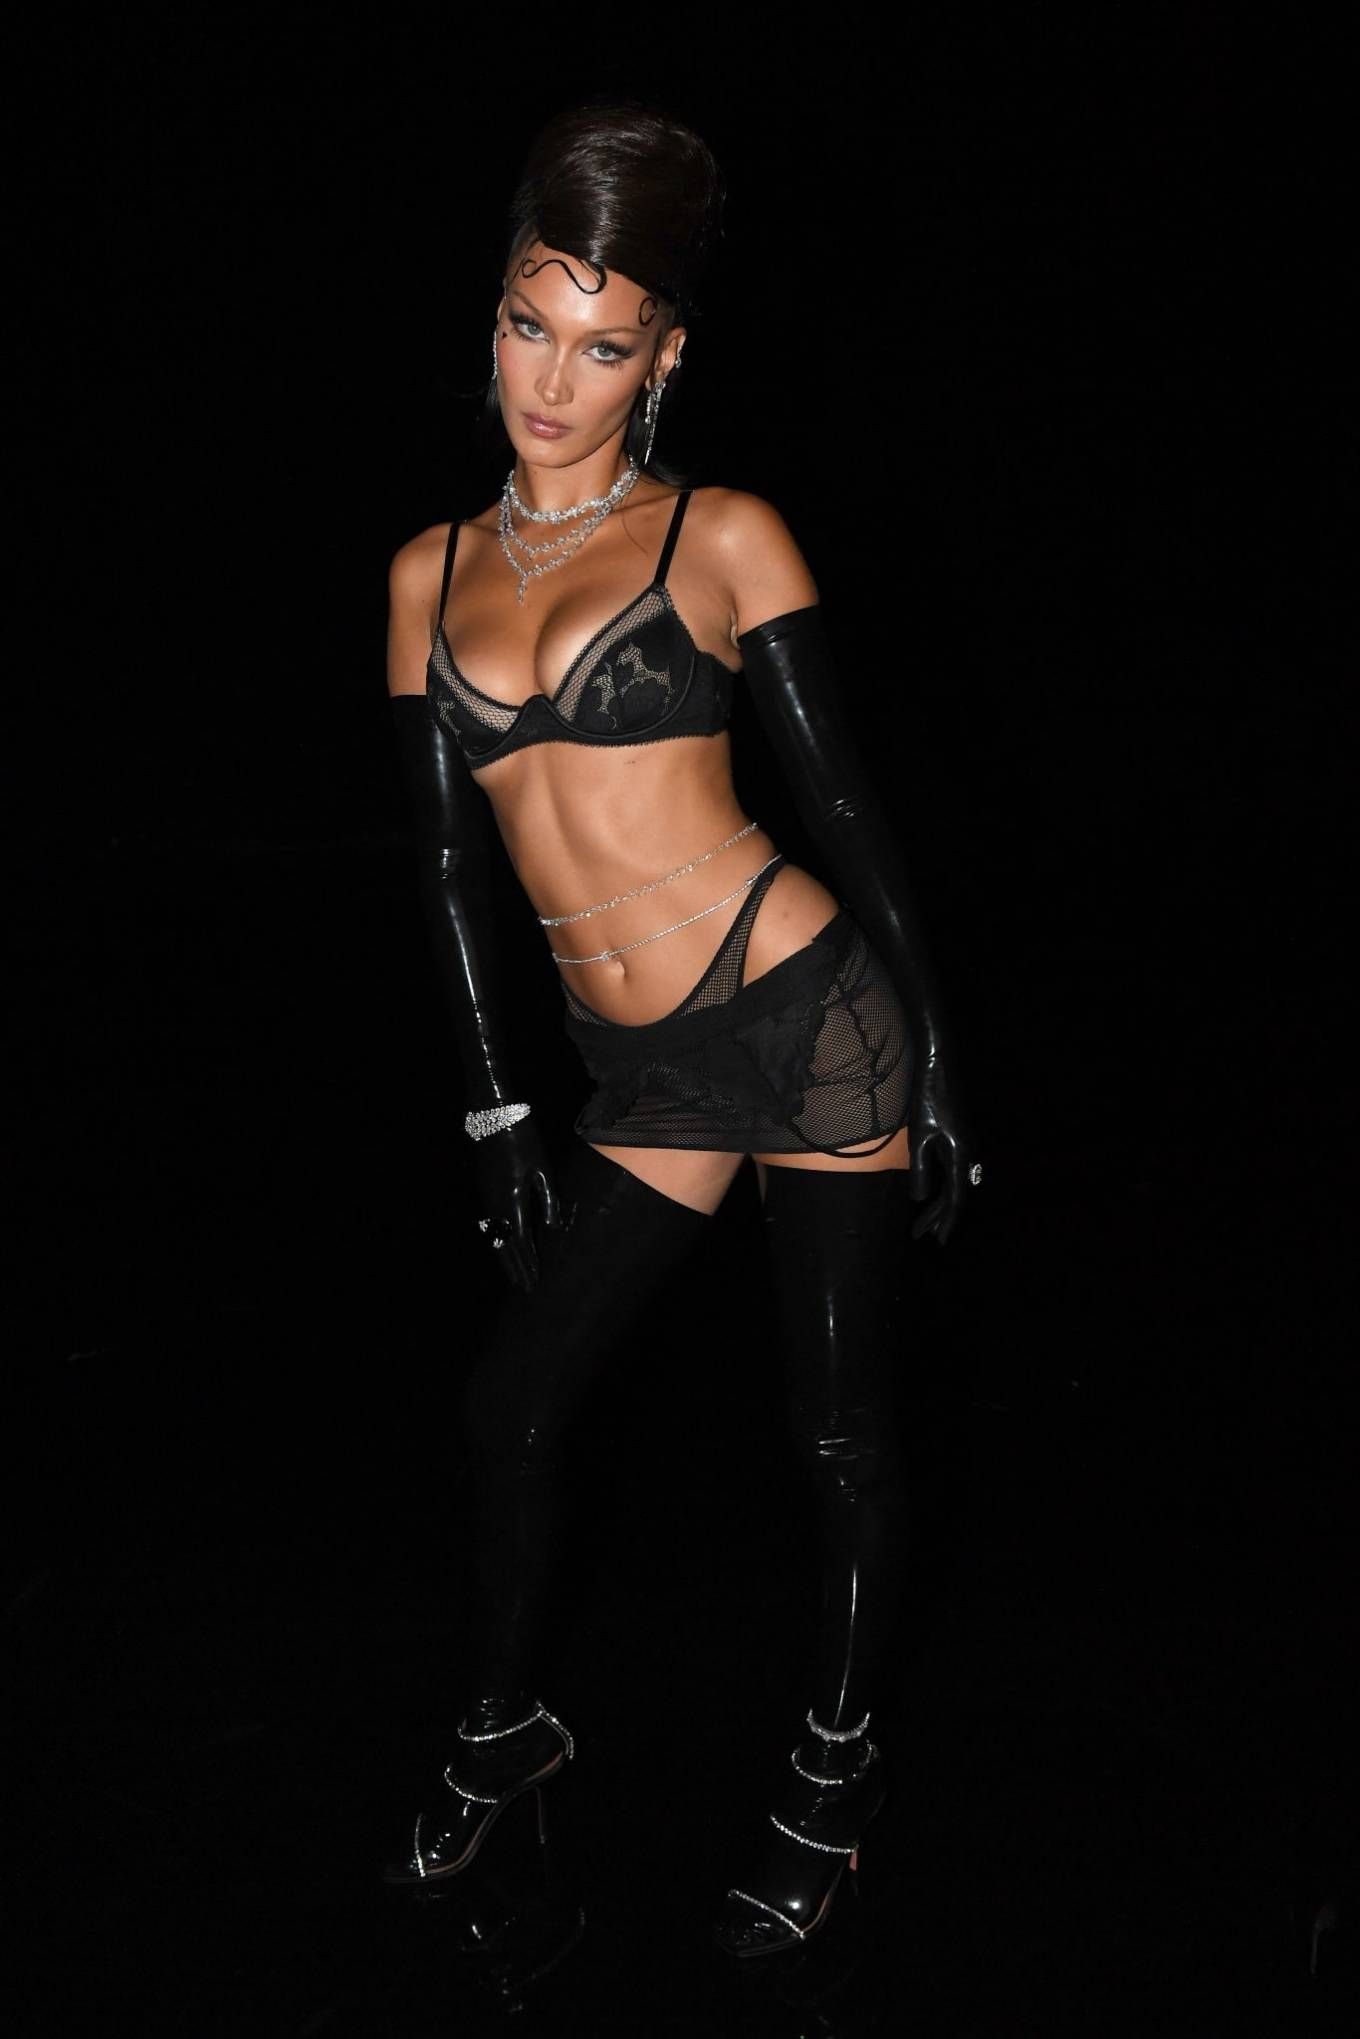 Bella Hadid Rihannas Savage X Fenty Show Vol 2 In La Bella Hadid Savage X Fenty Hadid